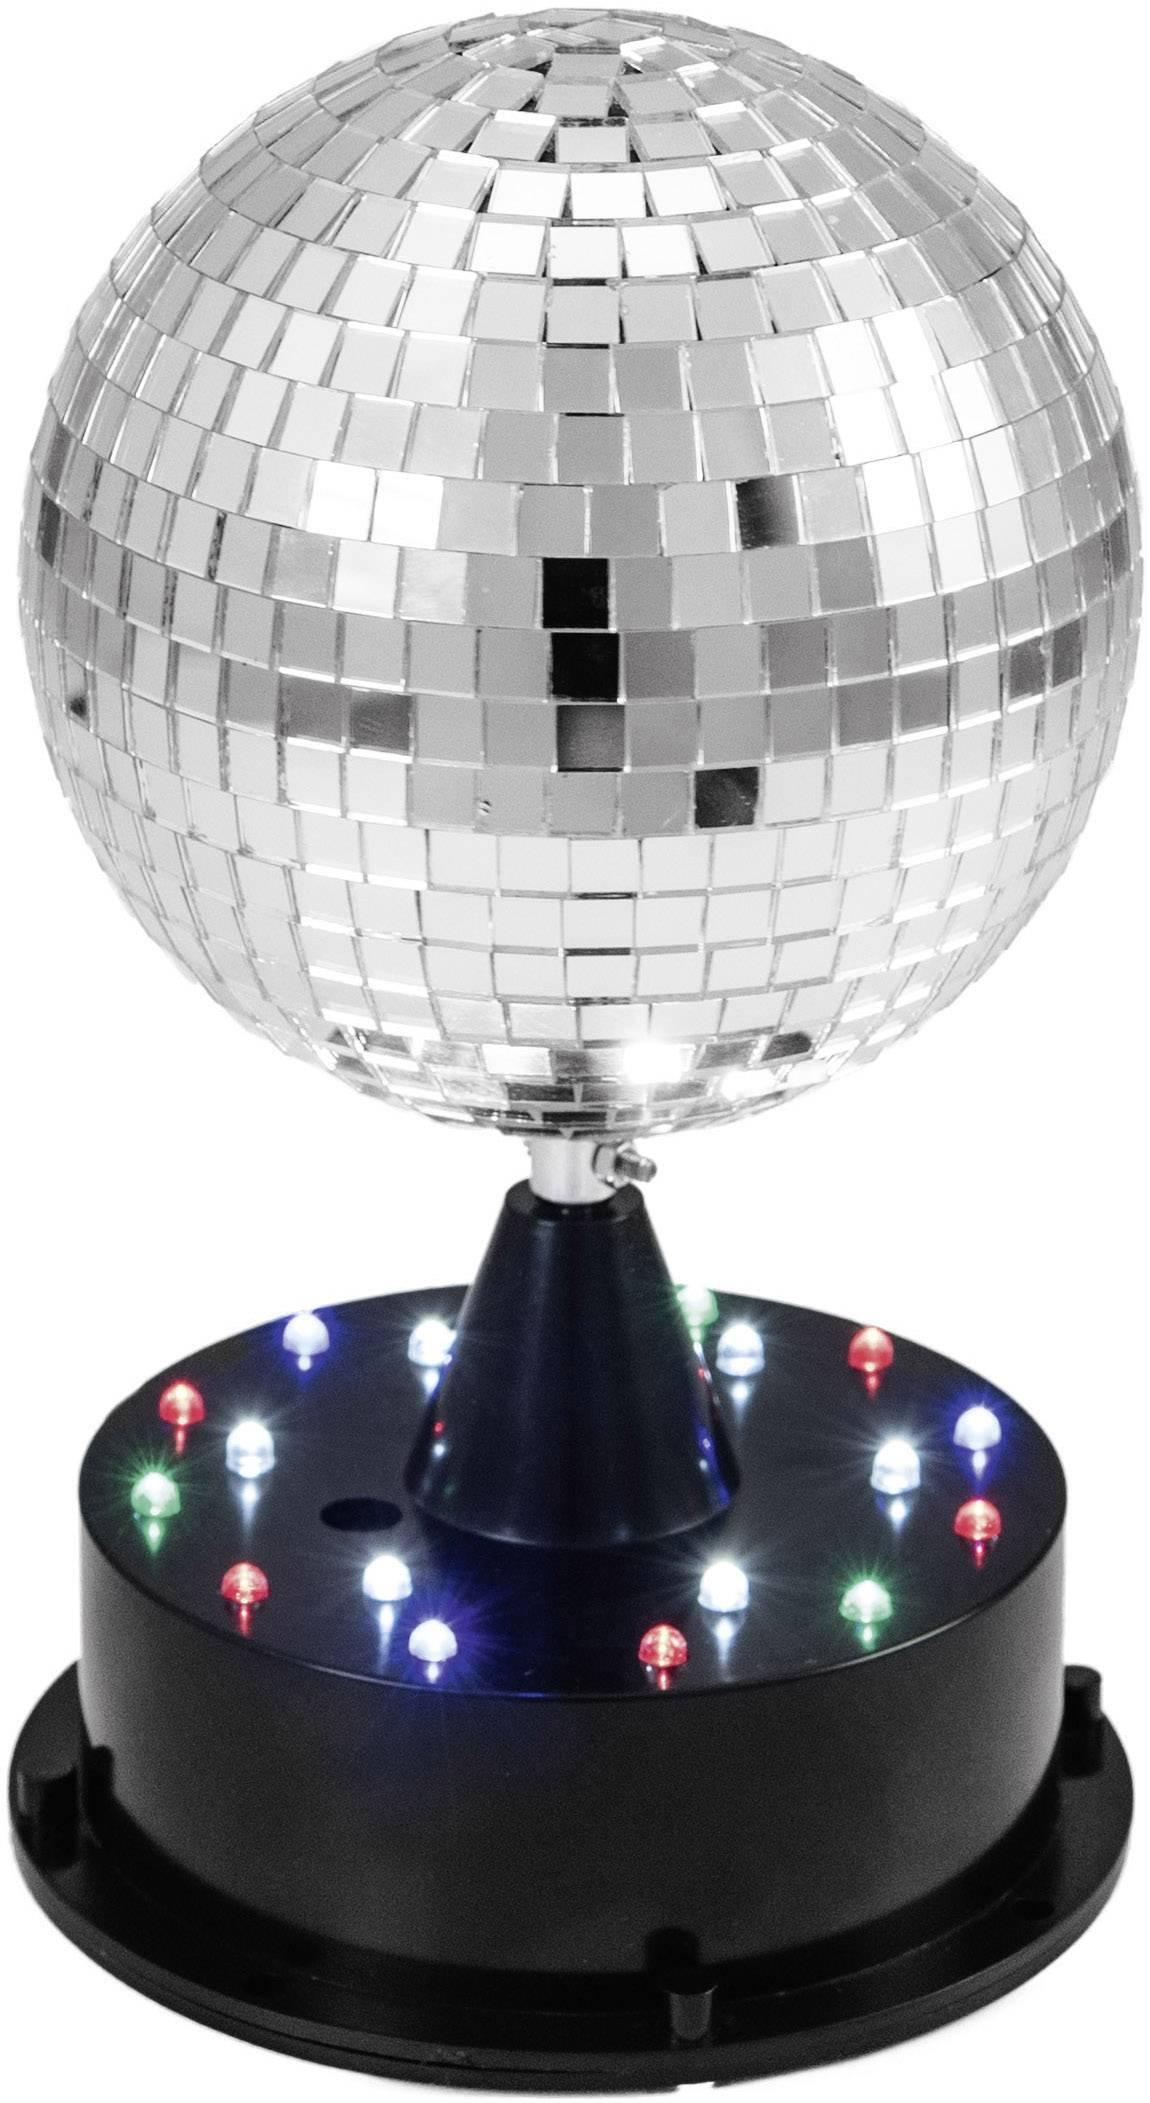 42109269 LED Spiegelbolset met standvoet, met LED-verlichting 13 cm ...